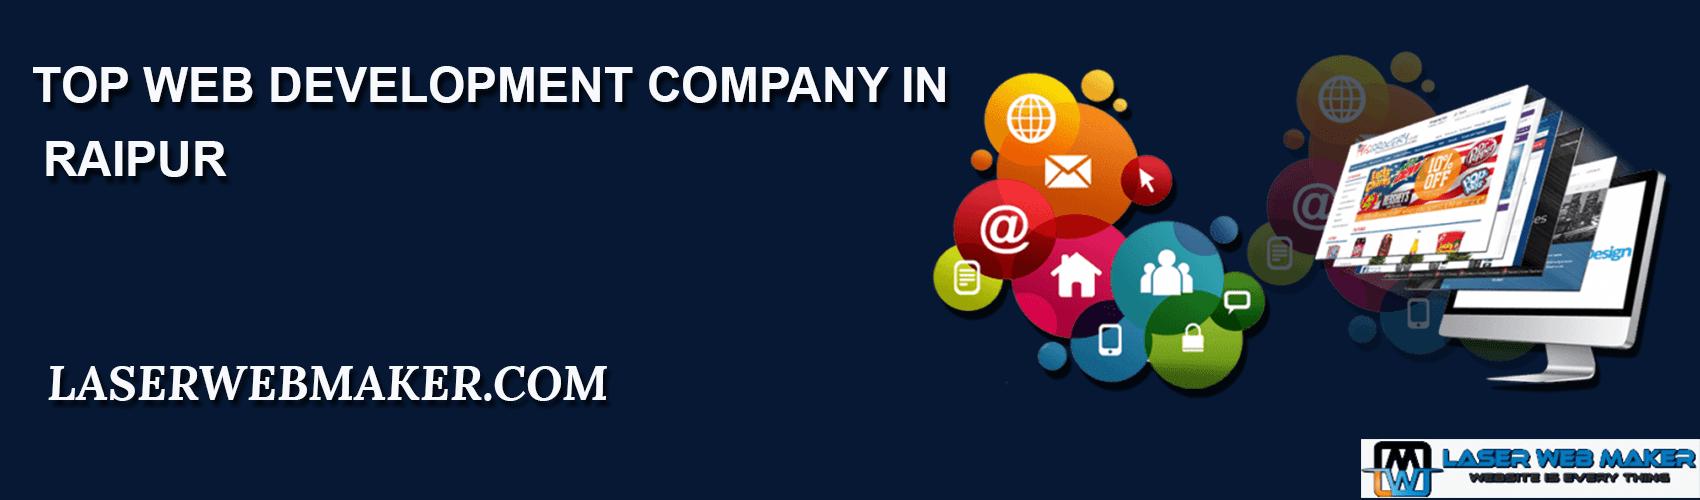 Top Web Development Company In Raipur